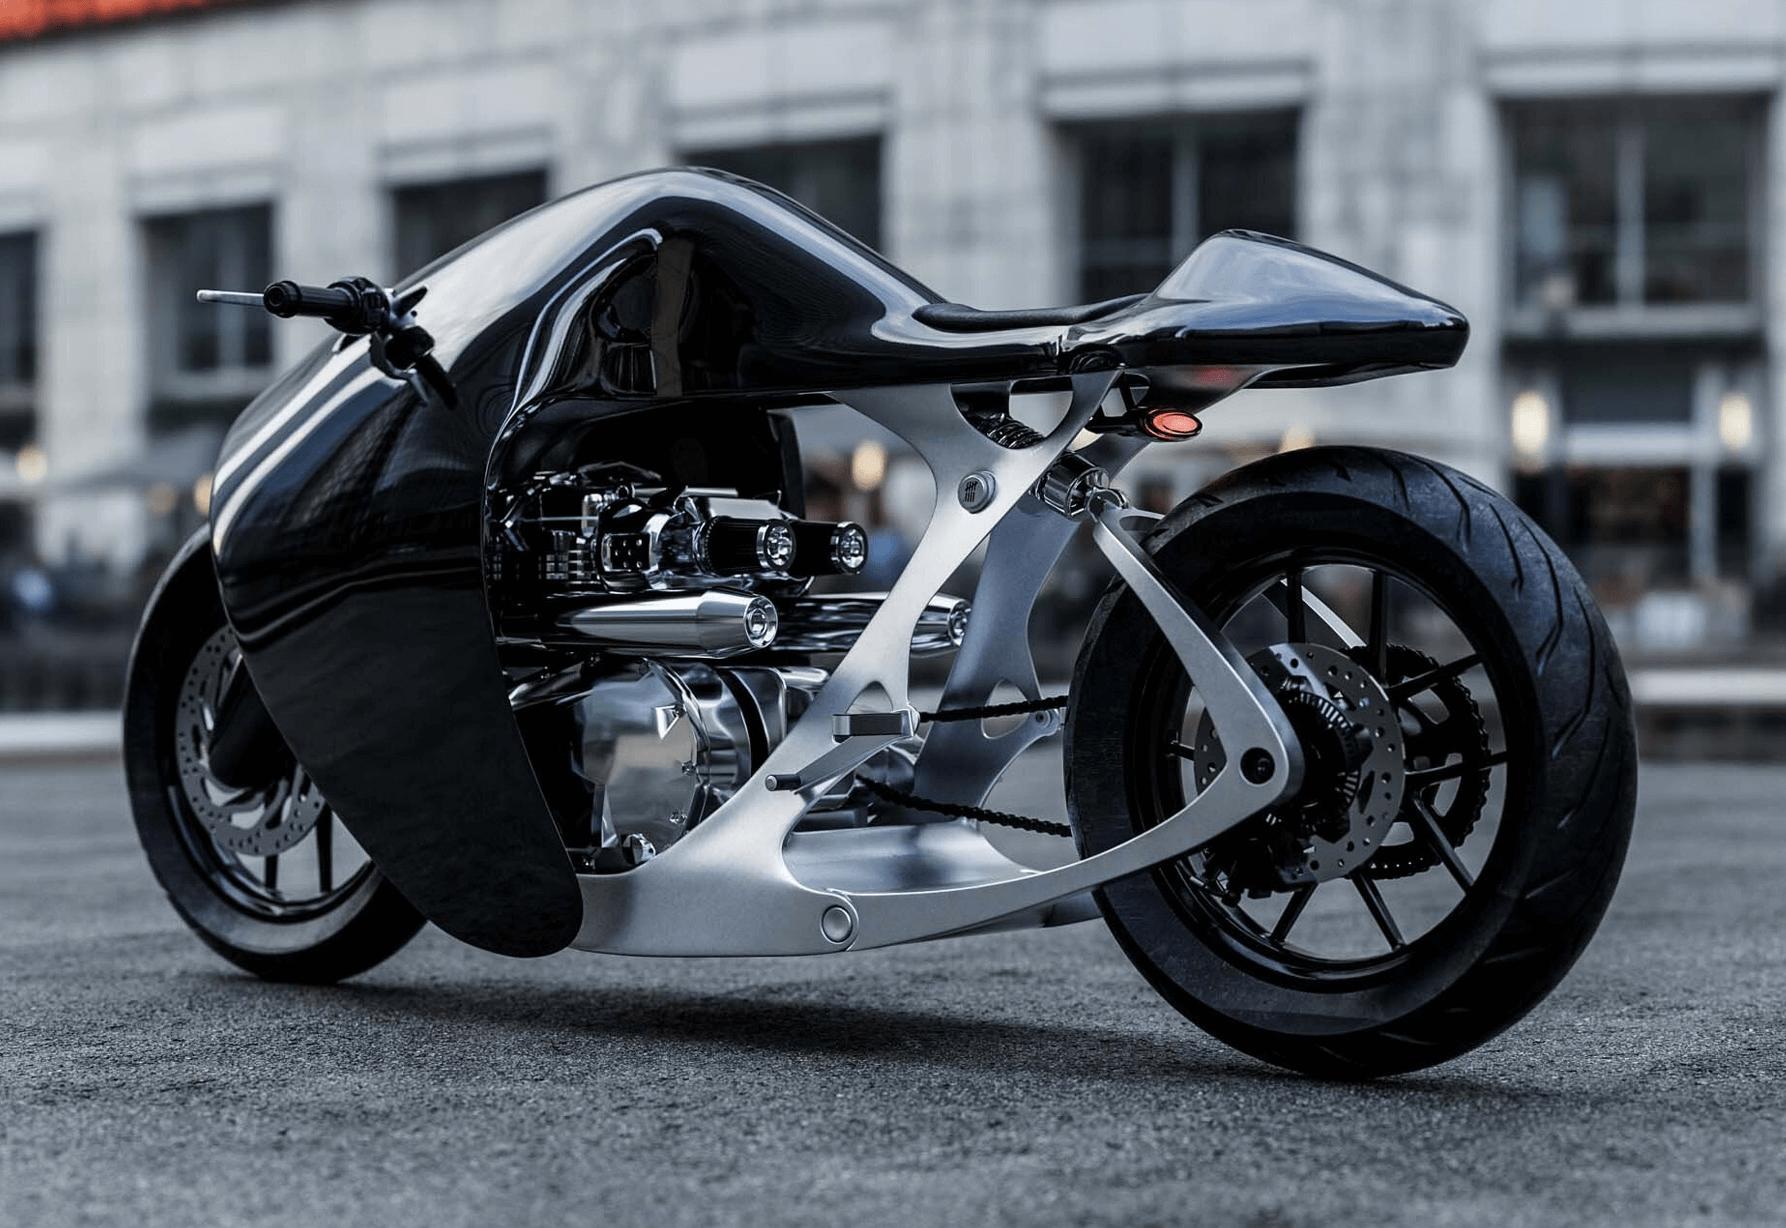 BANDIT9 SUPERMARINE MOTORSİKLET TASARIMI bilgi